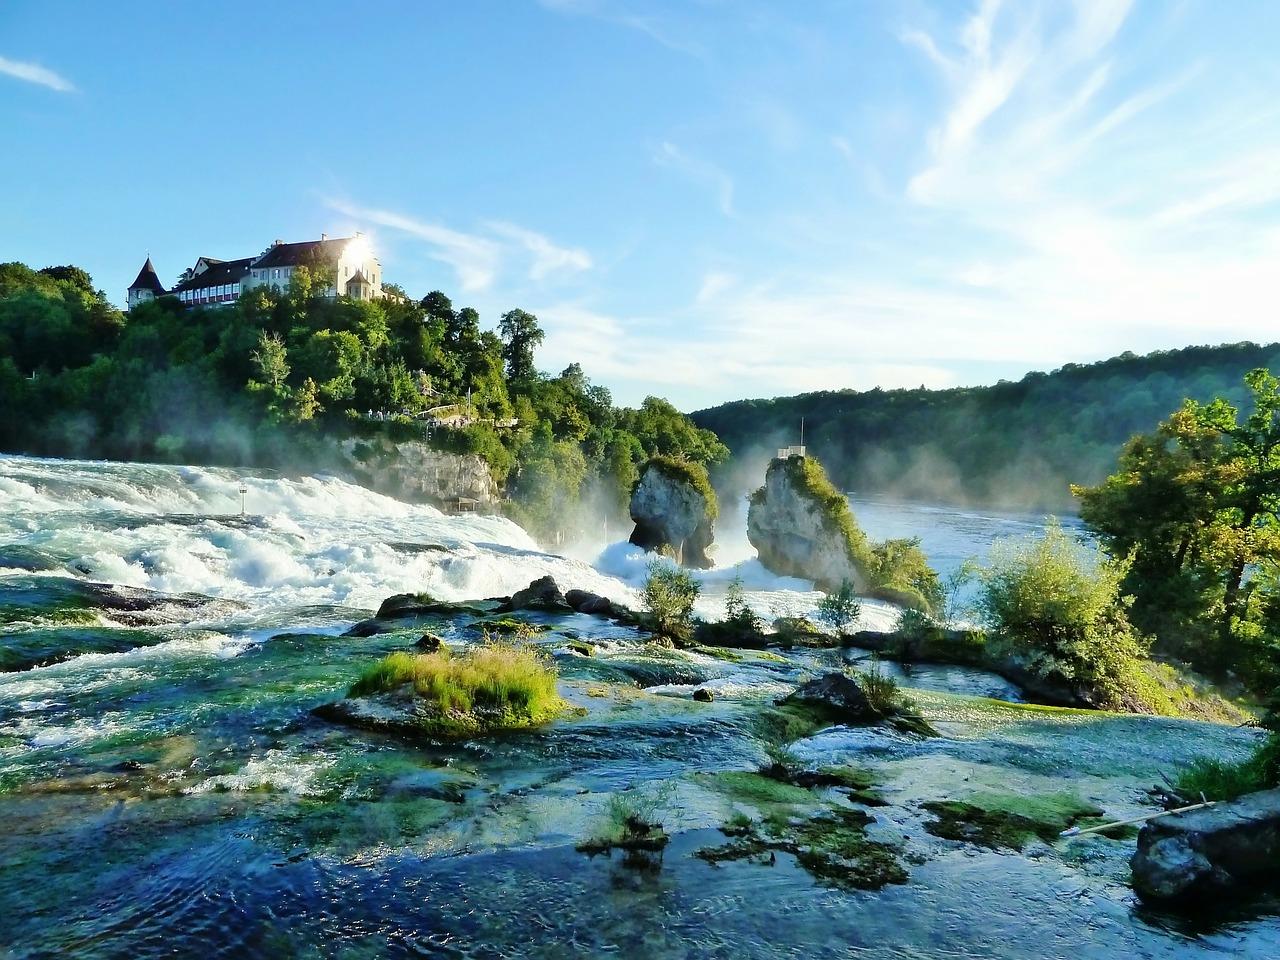 Switzerland waterfalls are stunningly beautiful